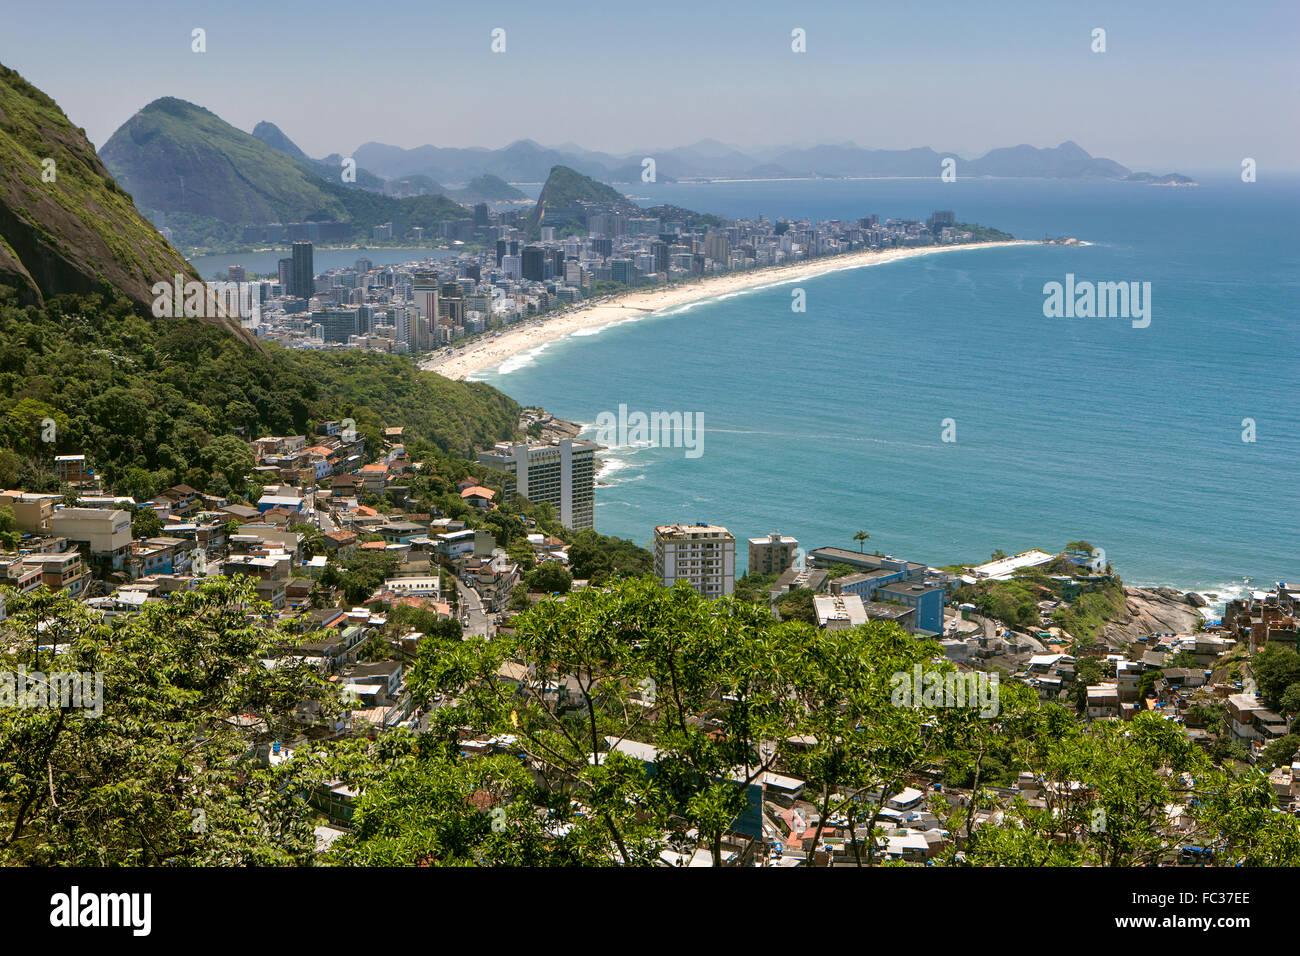 Rio de janeiro, Favela Vidigal, Ipanema Beach, district, Brazil - Stock Image